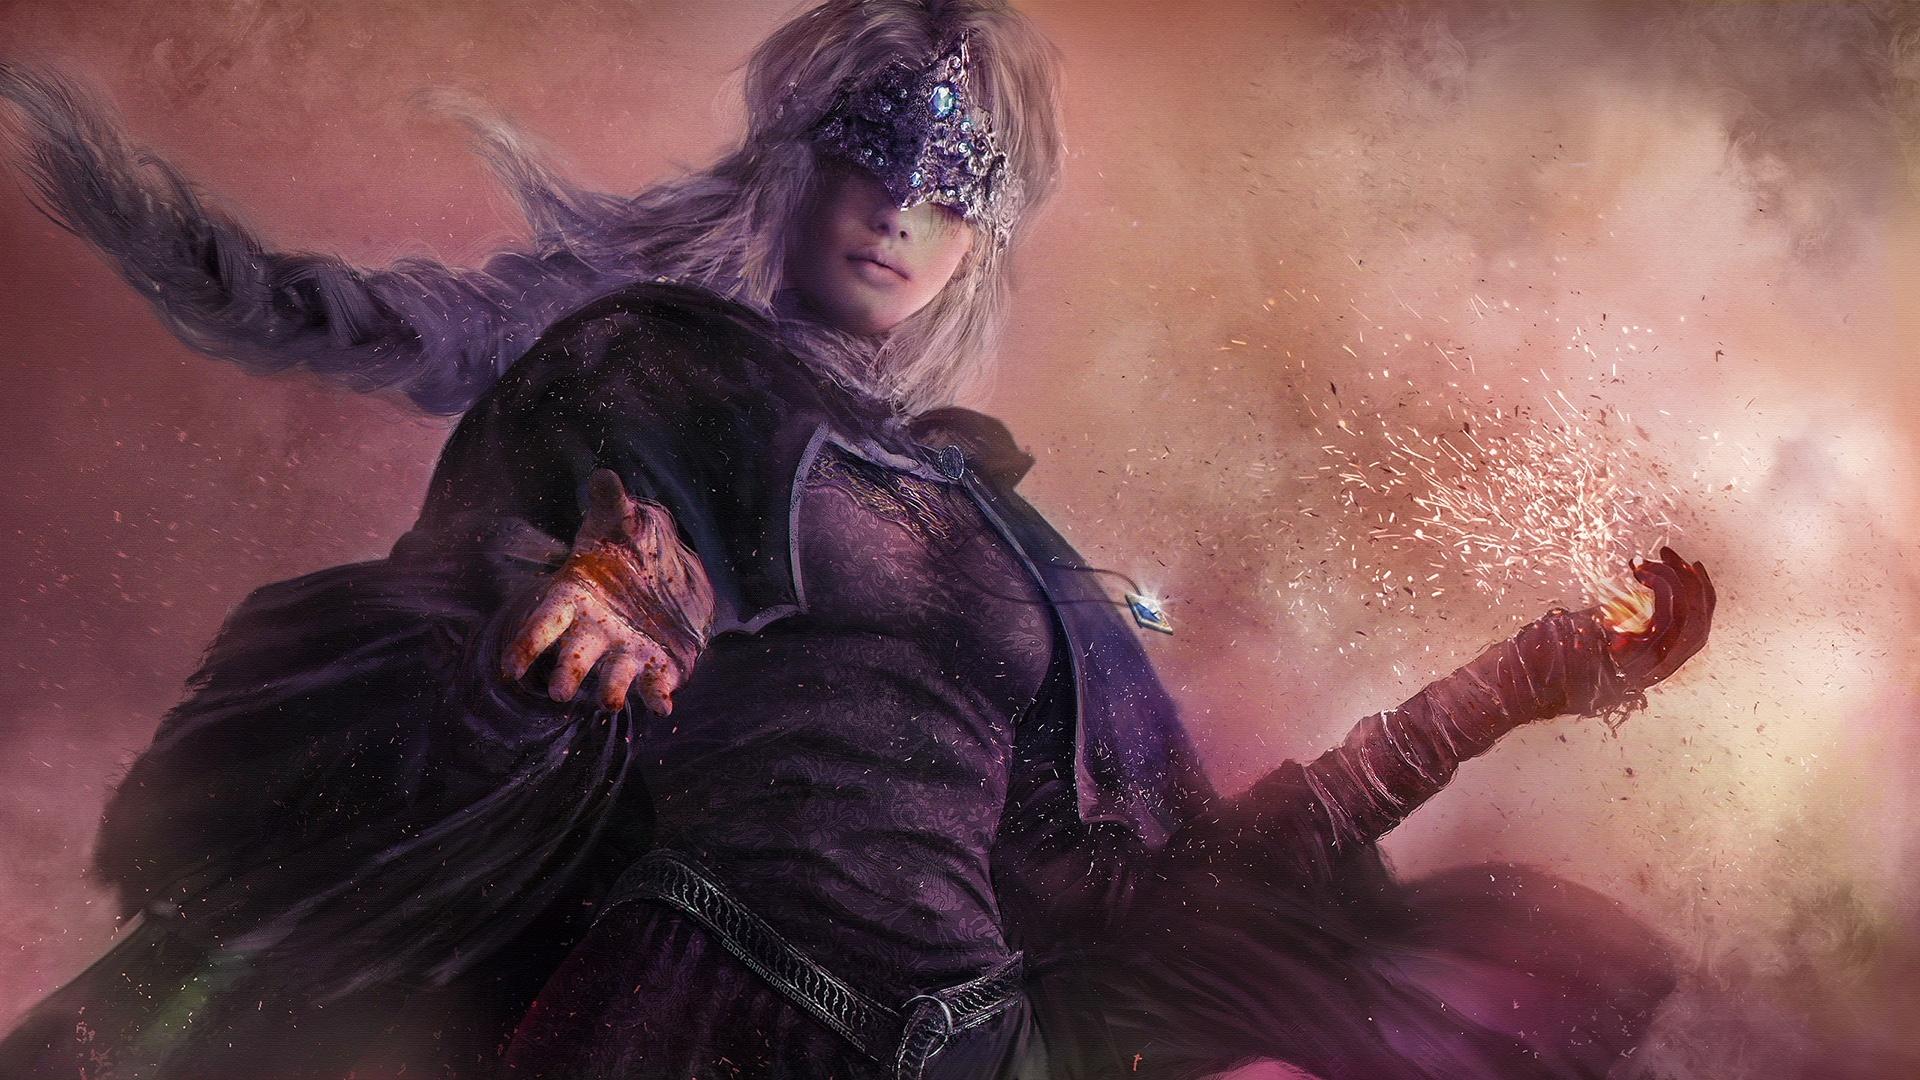 Dark Souls 3 desktop wallpaper free download